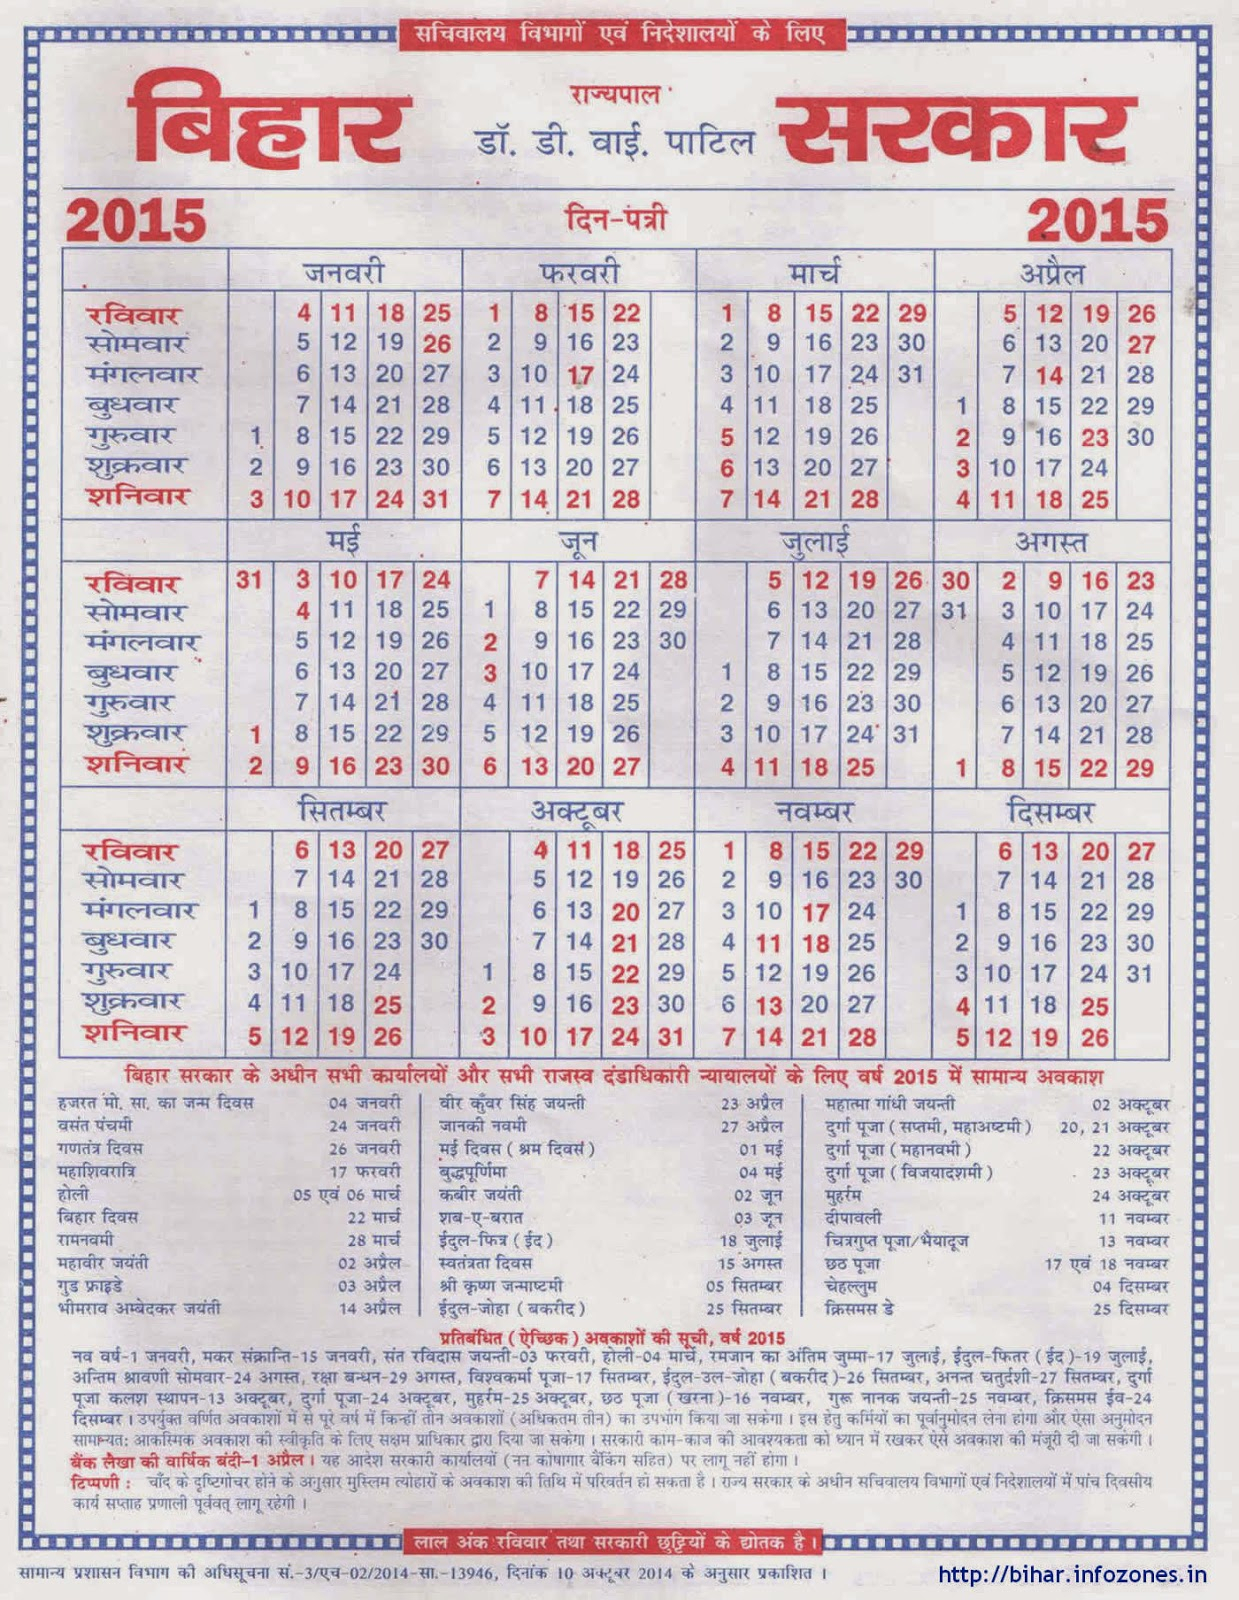 Bihar Government Calendar 2015 regarding Bihar Sarkar Clender